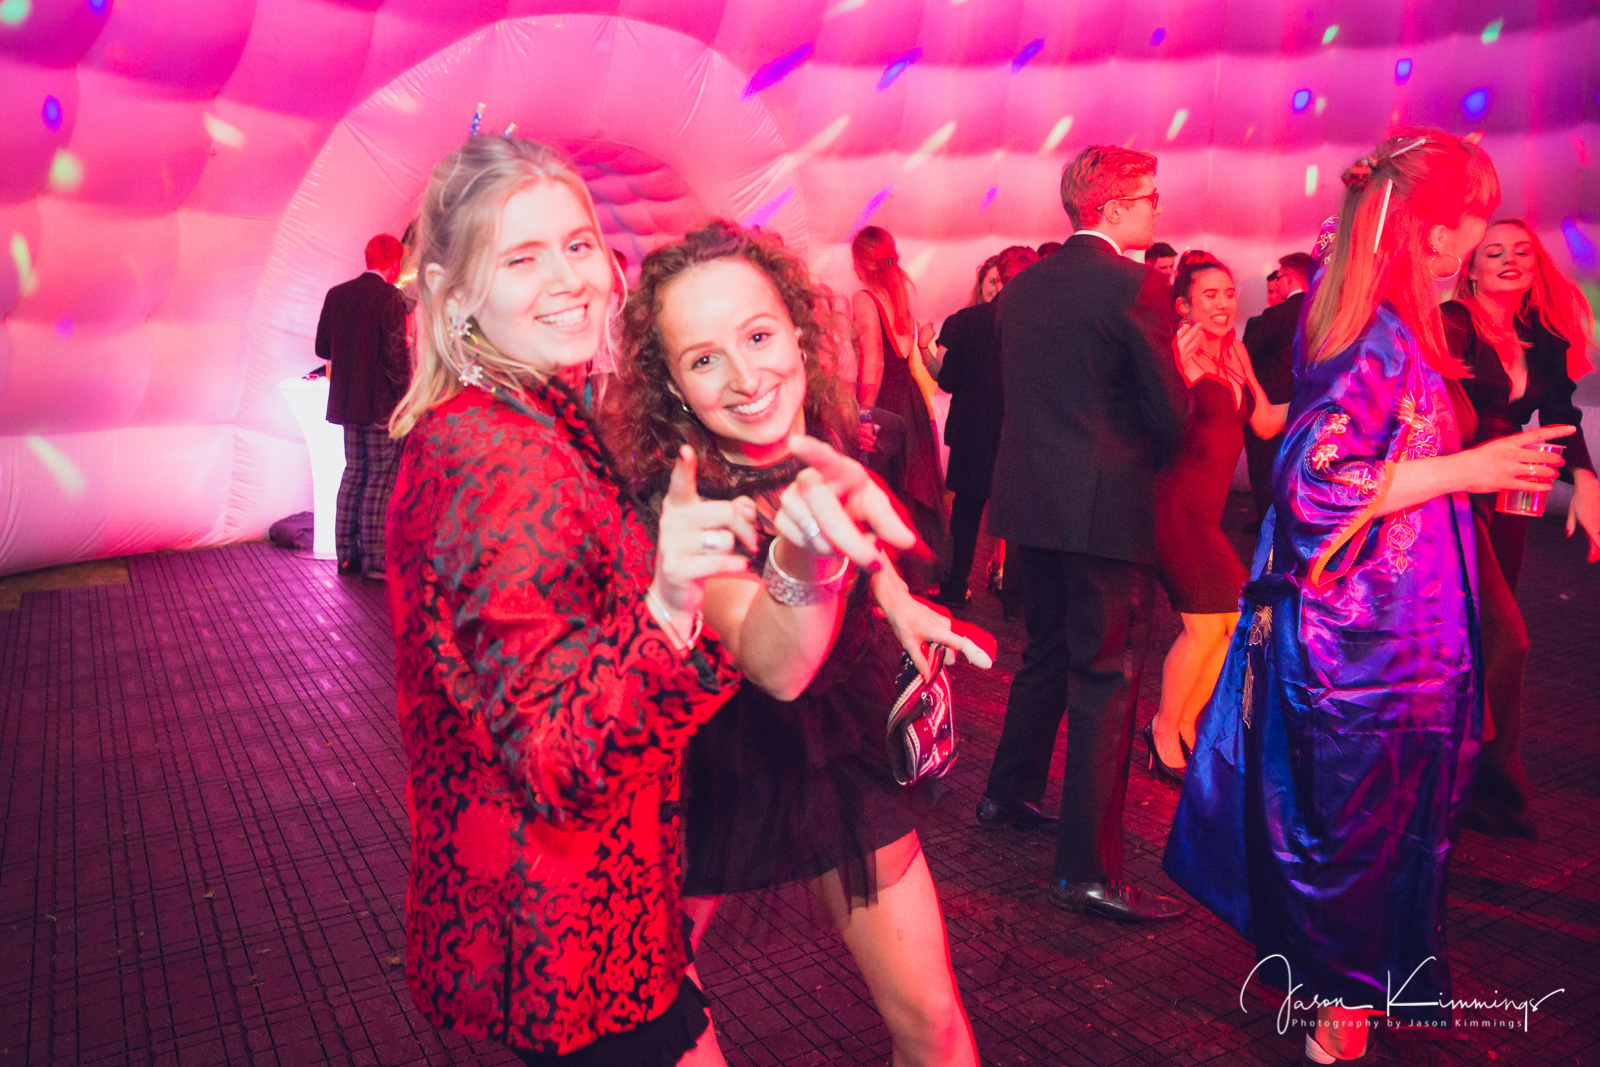 Party-event-photography-west-lothian-edinburgh-glasgow-29.jpg